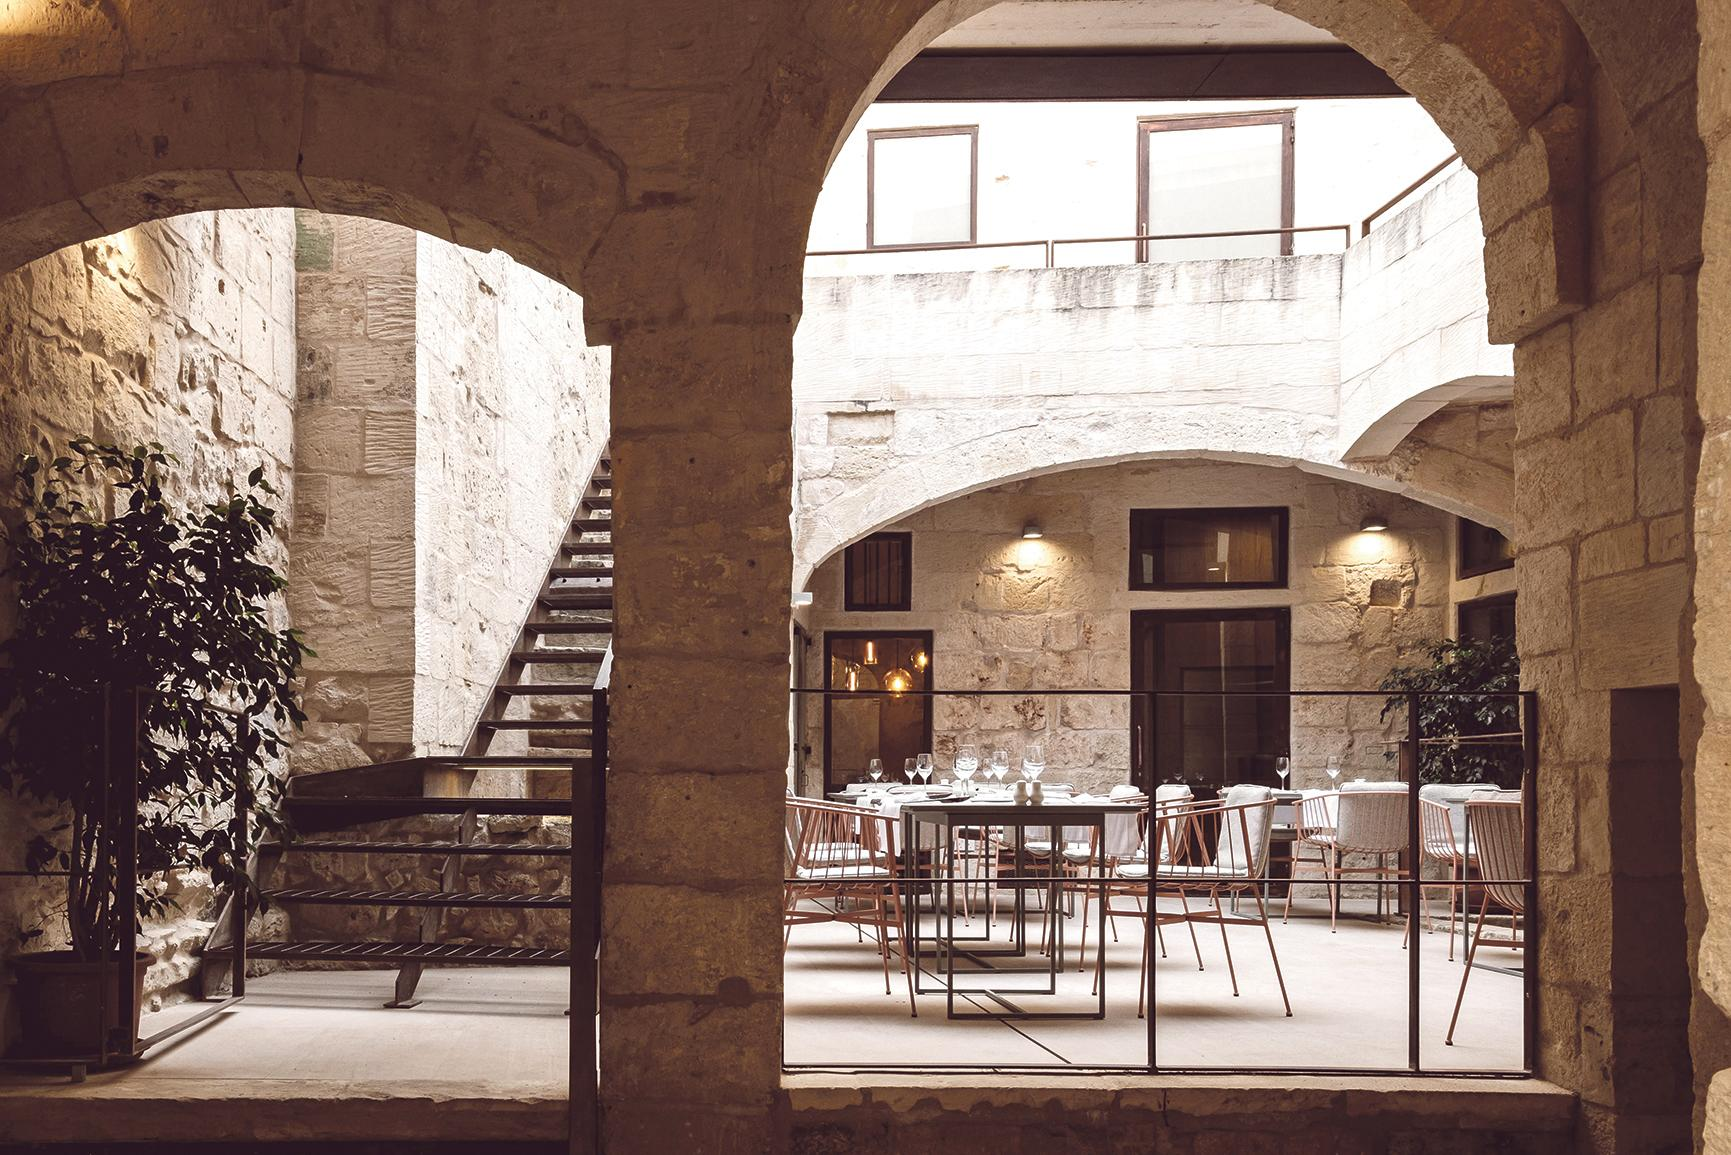 Vinaccia Restaurant in Rabat, designed by Kenneth Zammit Endrich and Samuel Cassar